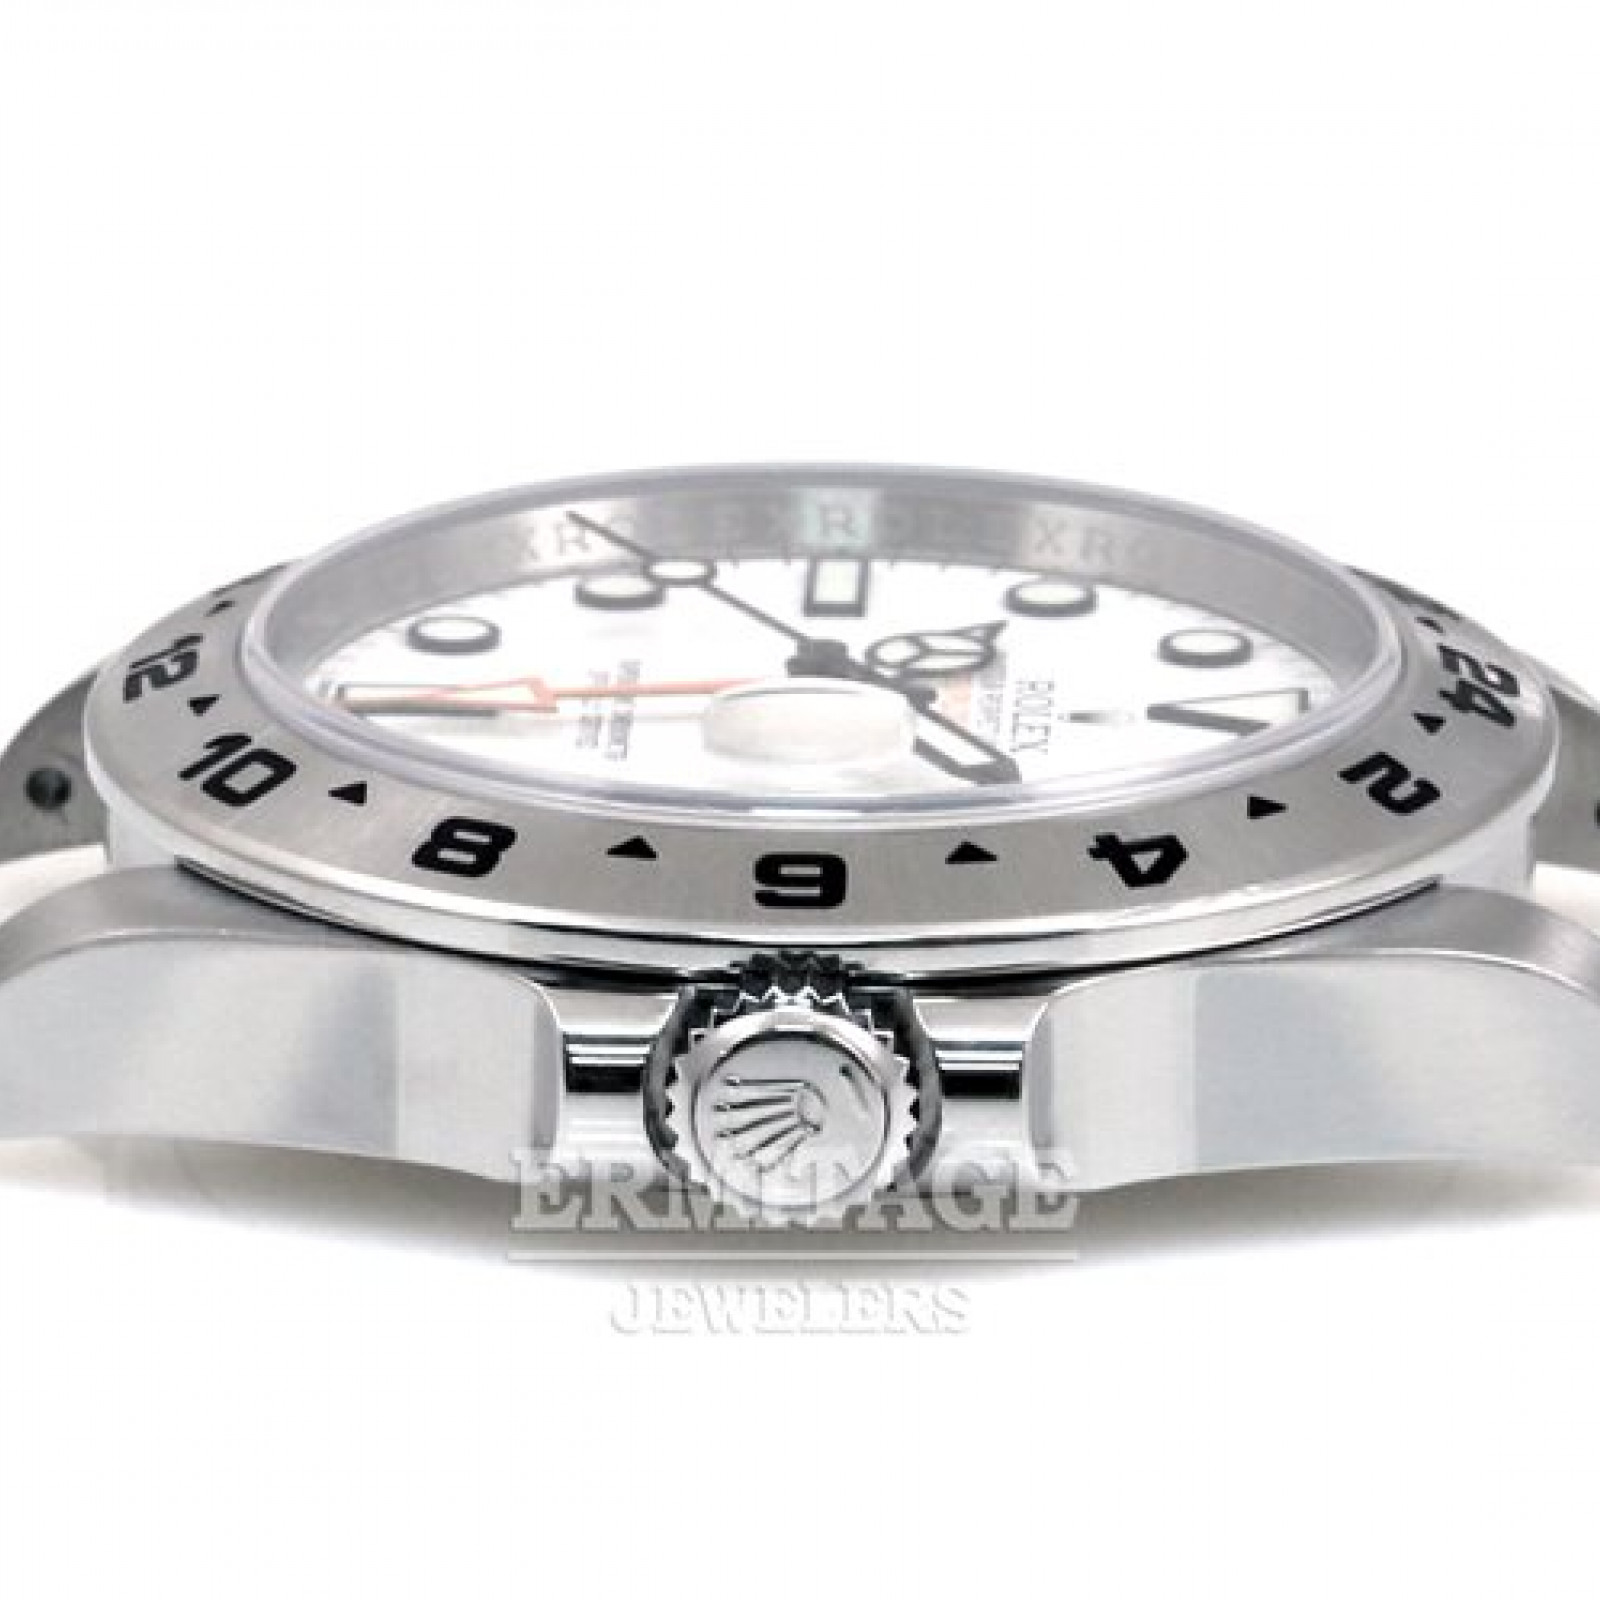 Rolex Explorer II 216570 42 mm  Polar